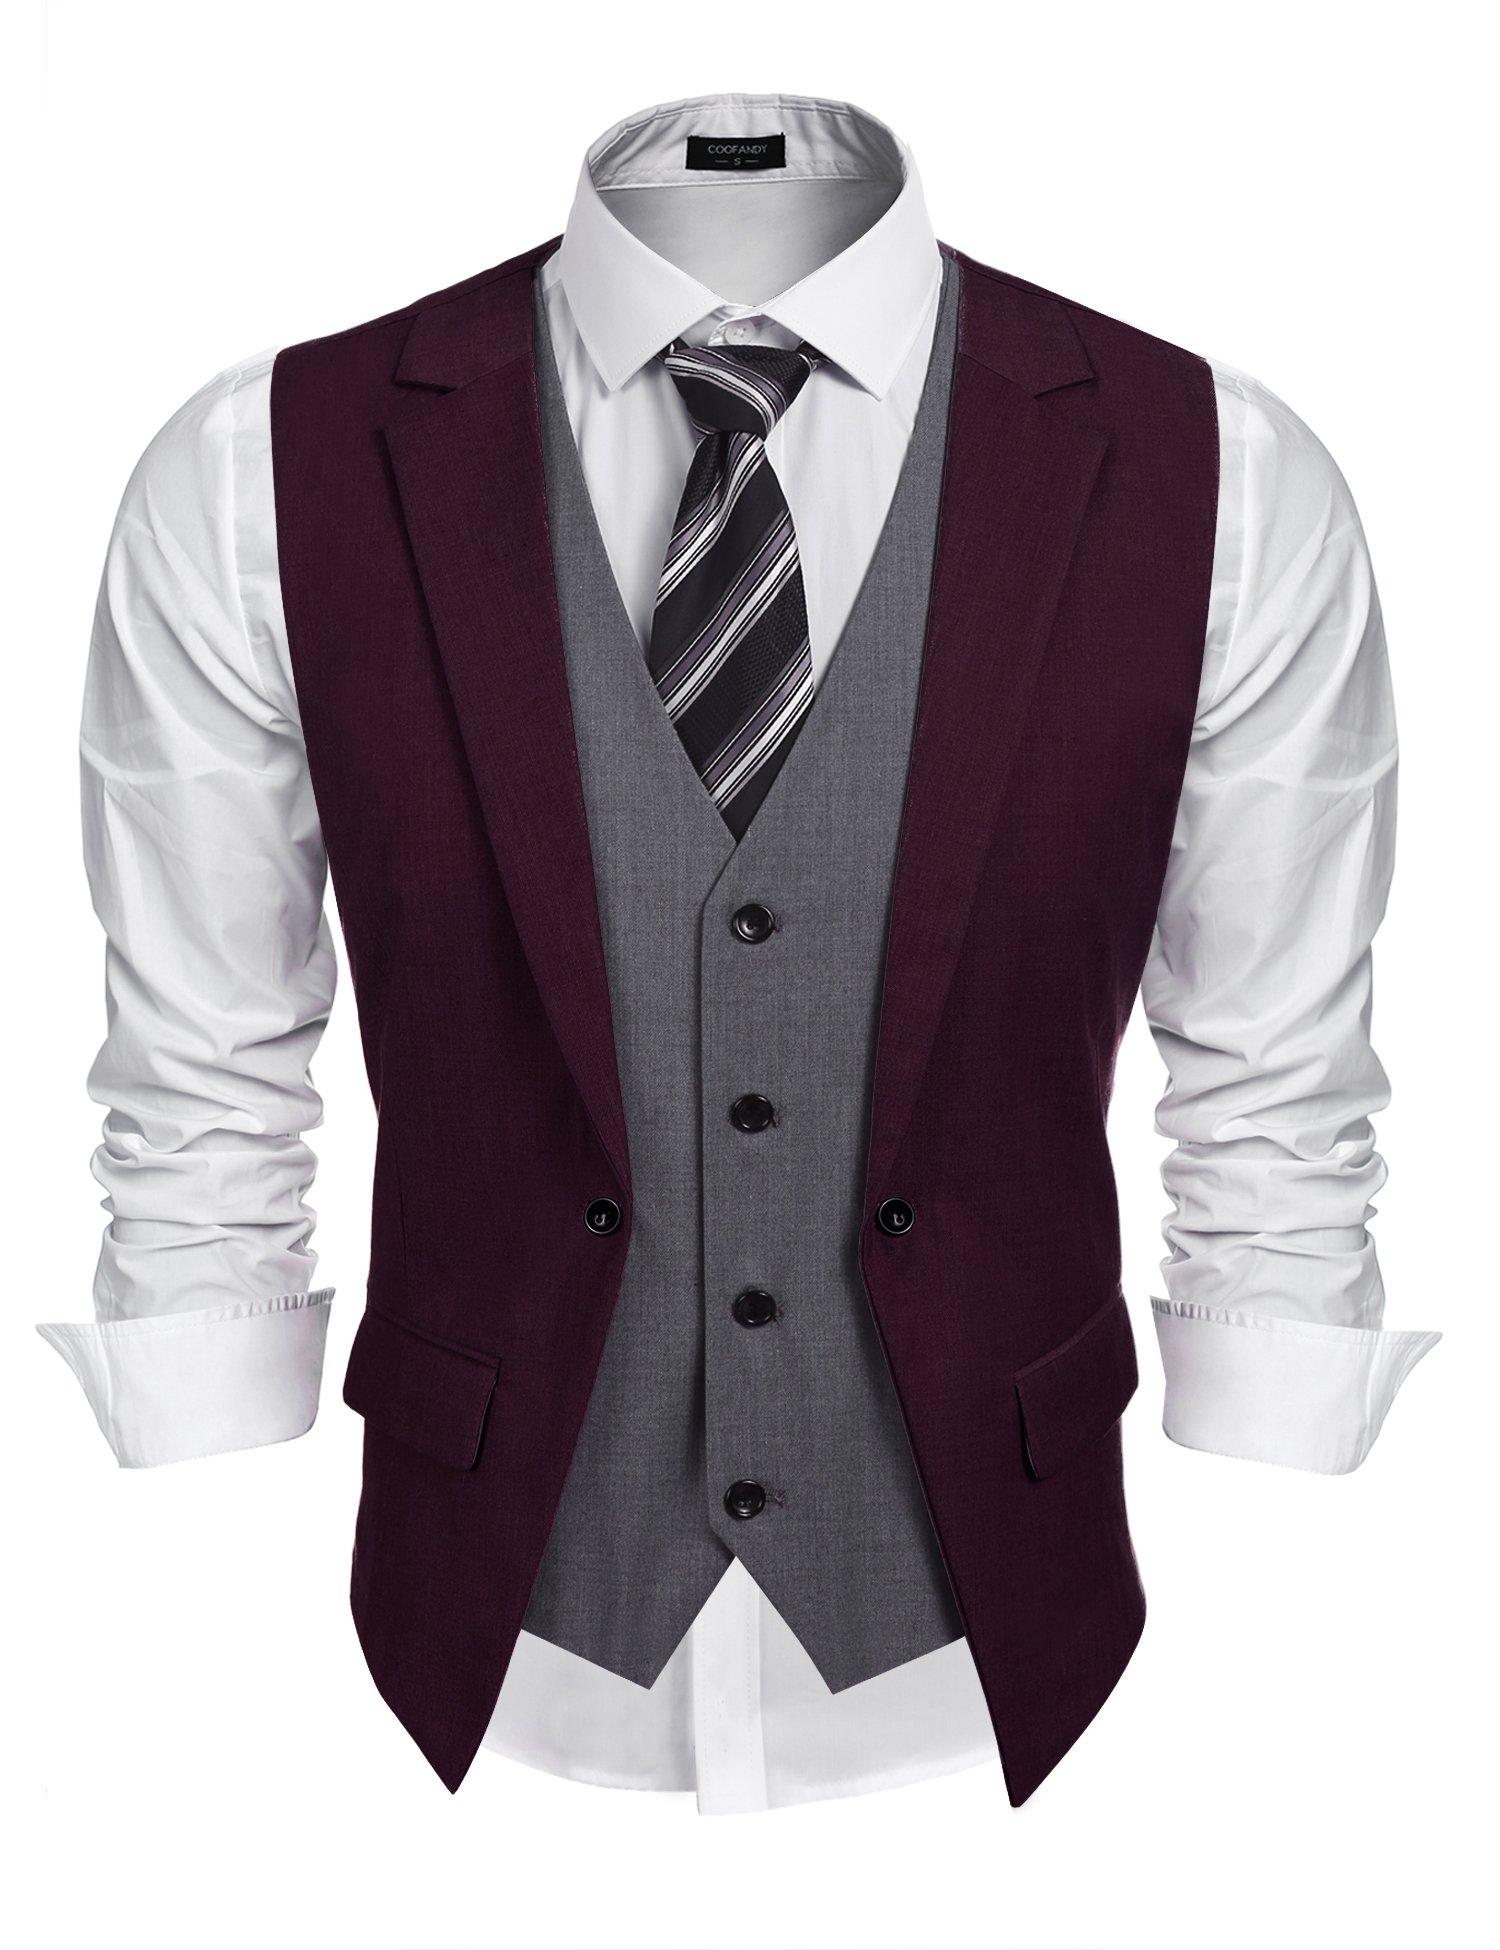 Coofandy Mens Formal Fashion Layered Vest Waistcoat Dress Vest (XL, Wine Red)